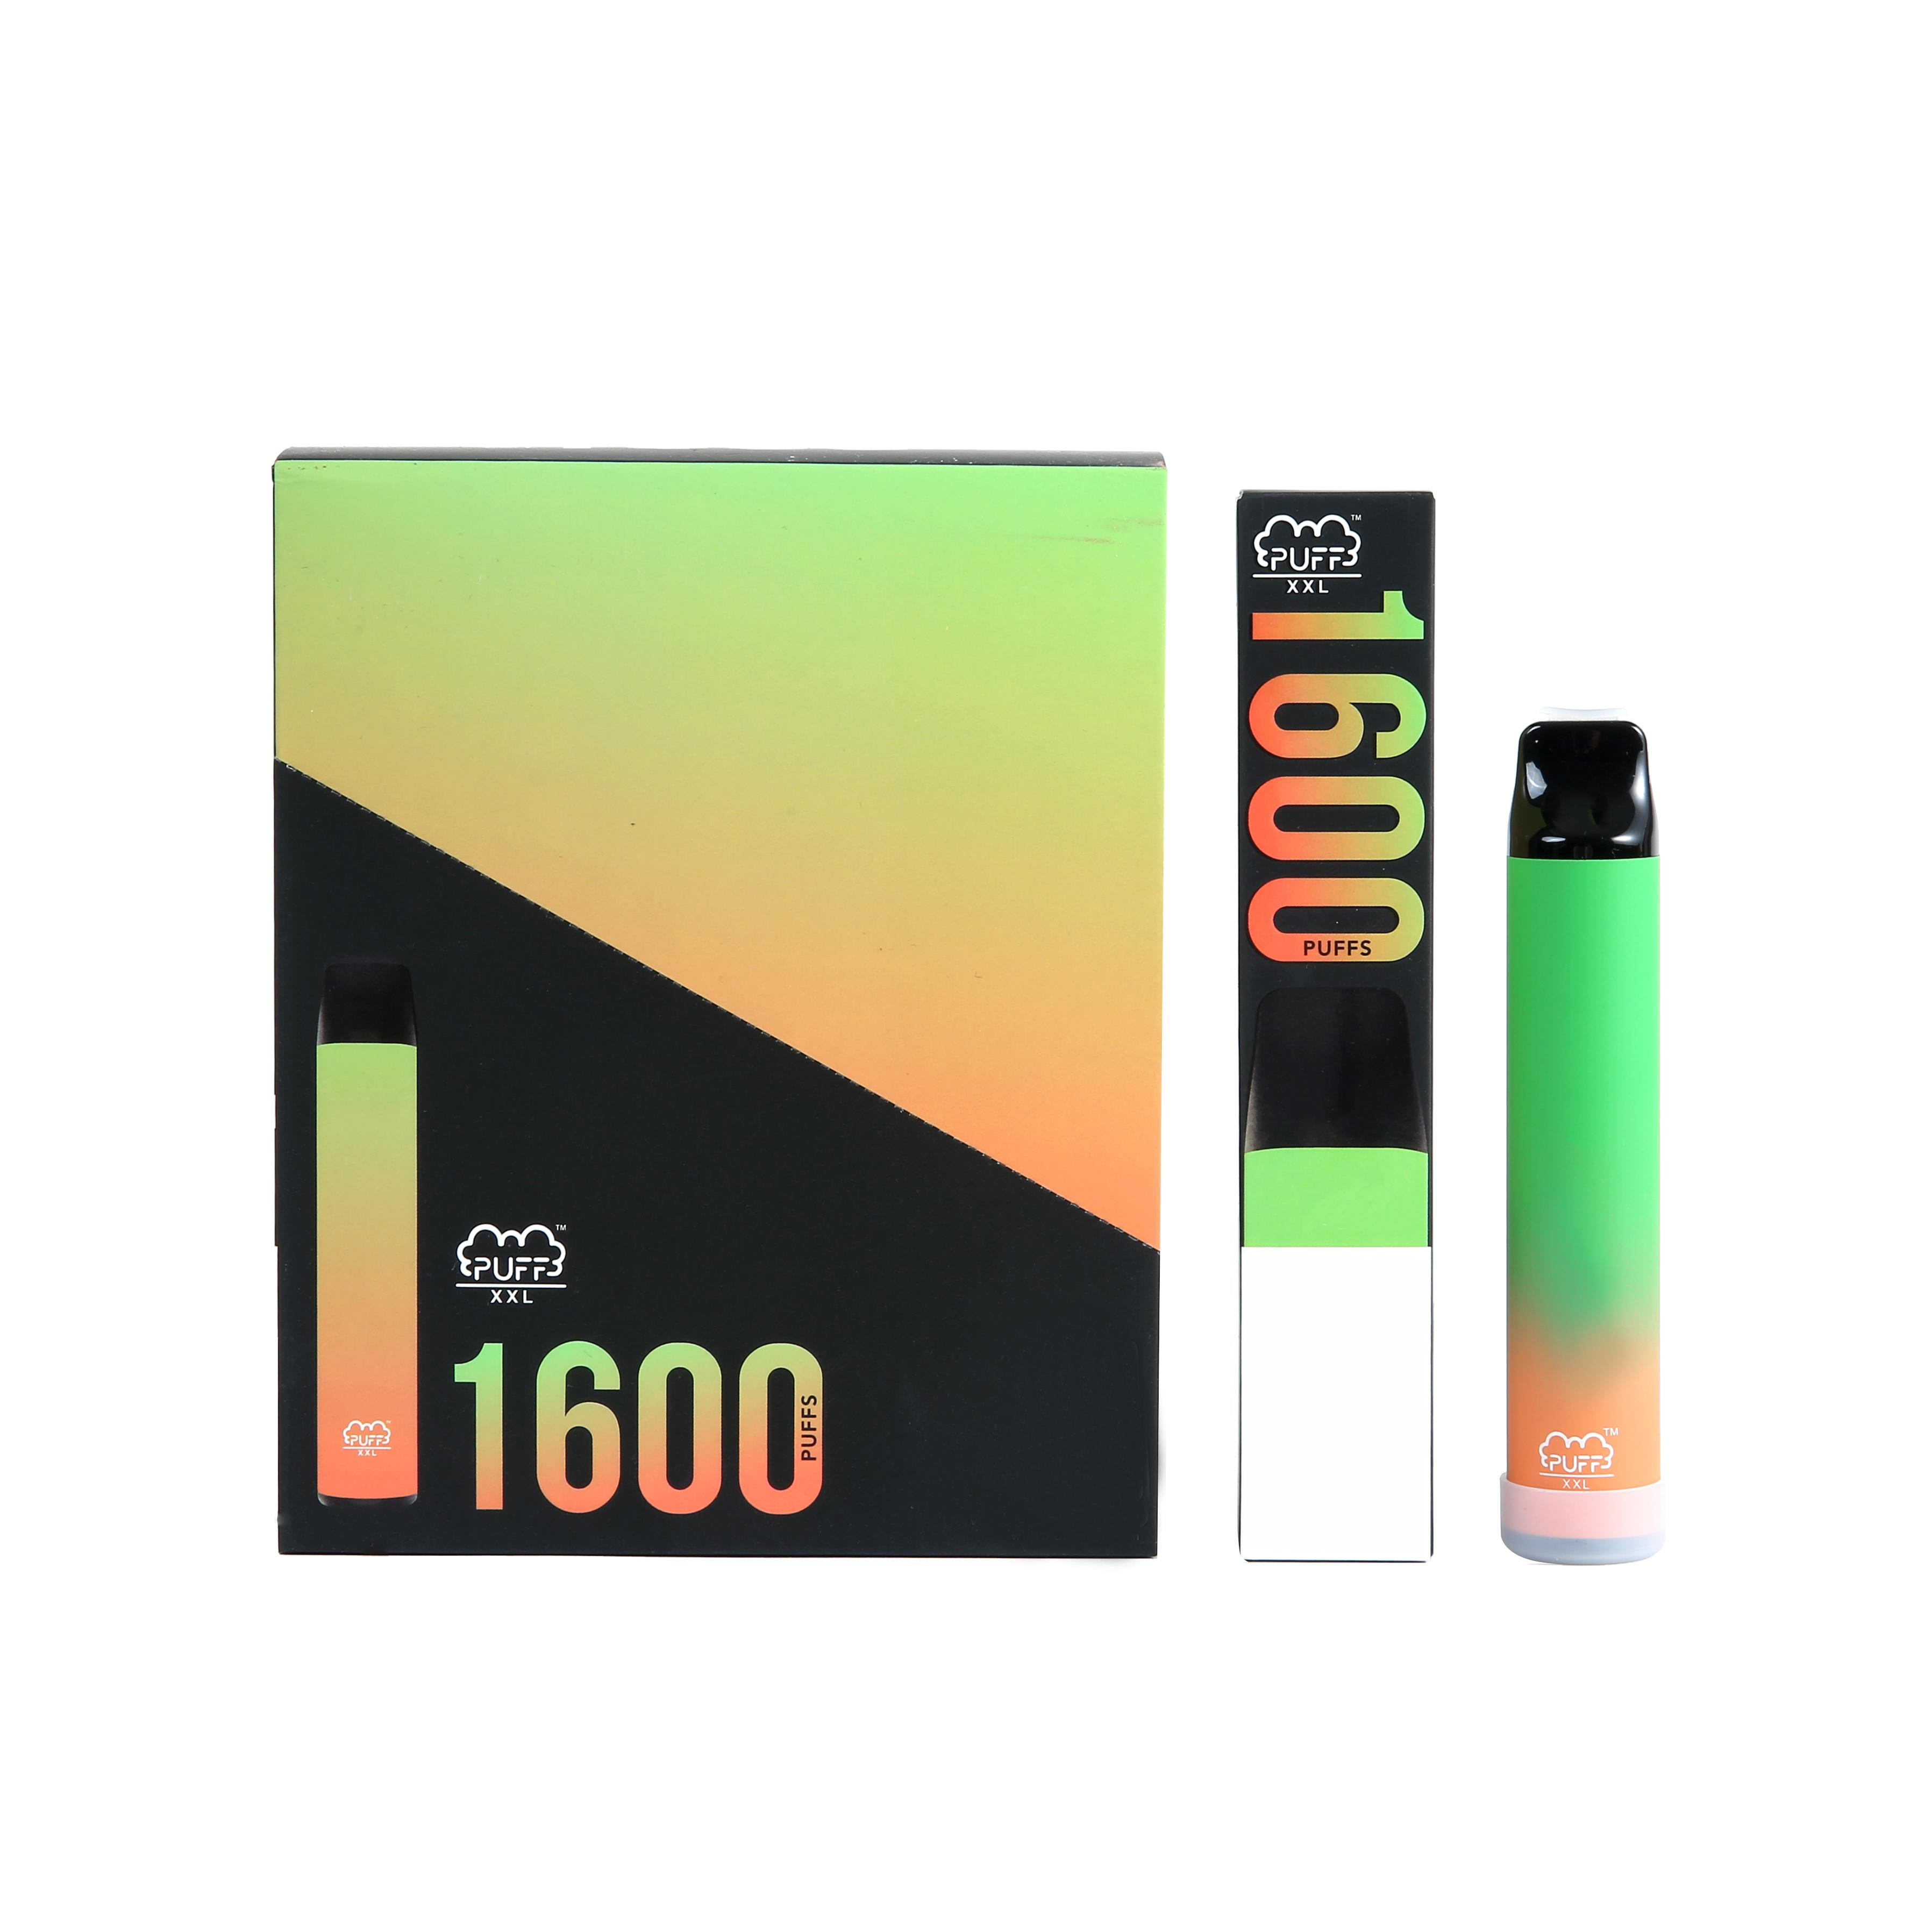 Ecigarettes monouso PUFFO XXL Dispositivo VAPE Pen 1600Puffs Bar 600mAh 4ml Cartucce Pod Pod Pre-riempita VAPOR E CIGS Portatile VAPorizer Kit